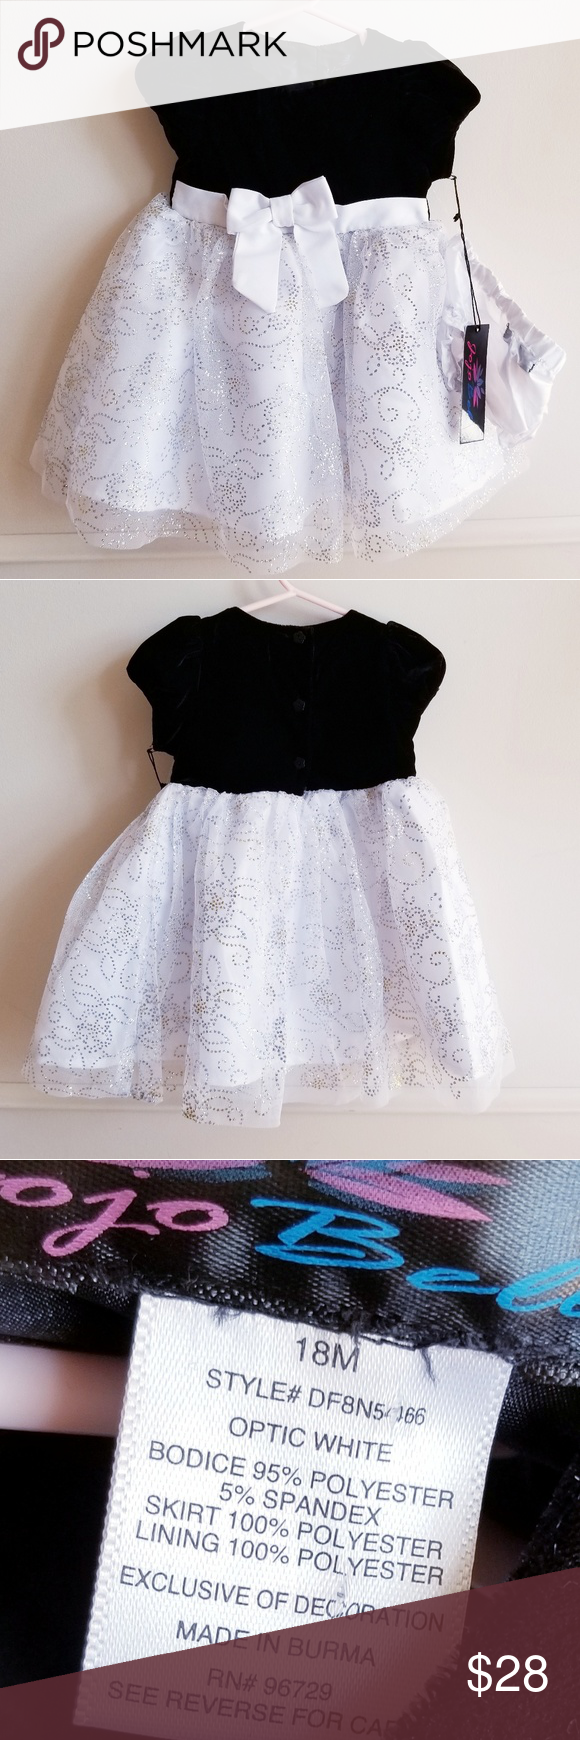 Jojo belle black and white holiday formal dress nwt my posh picks